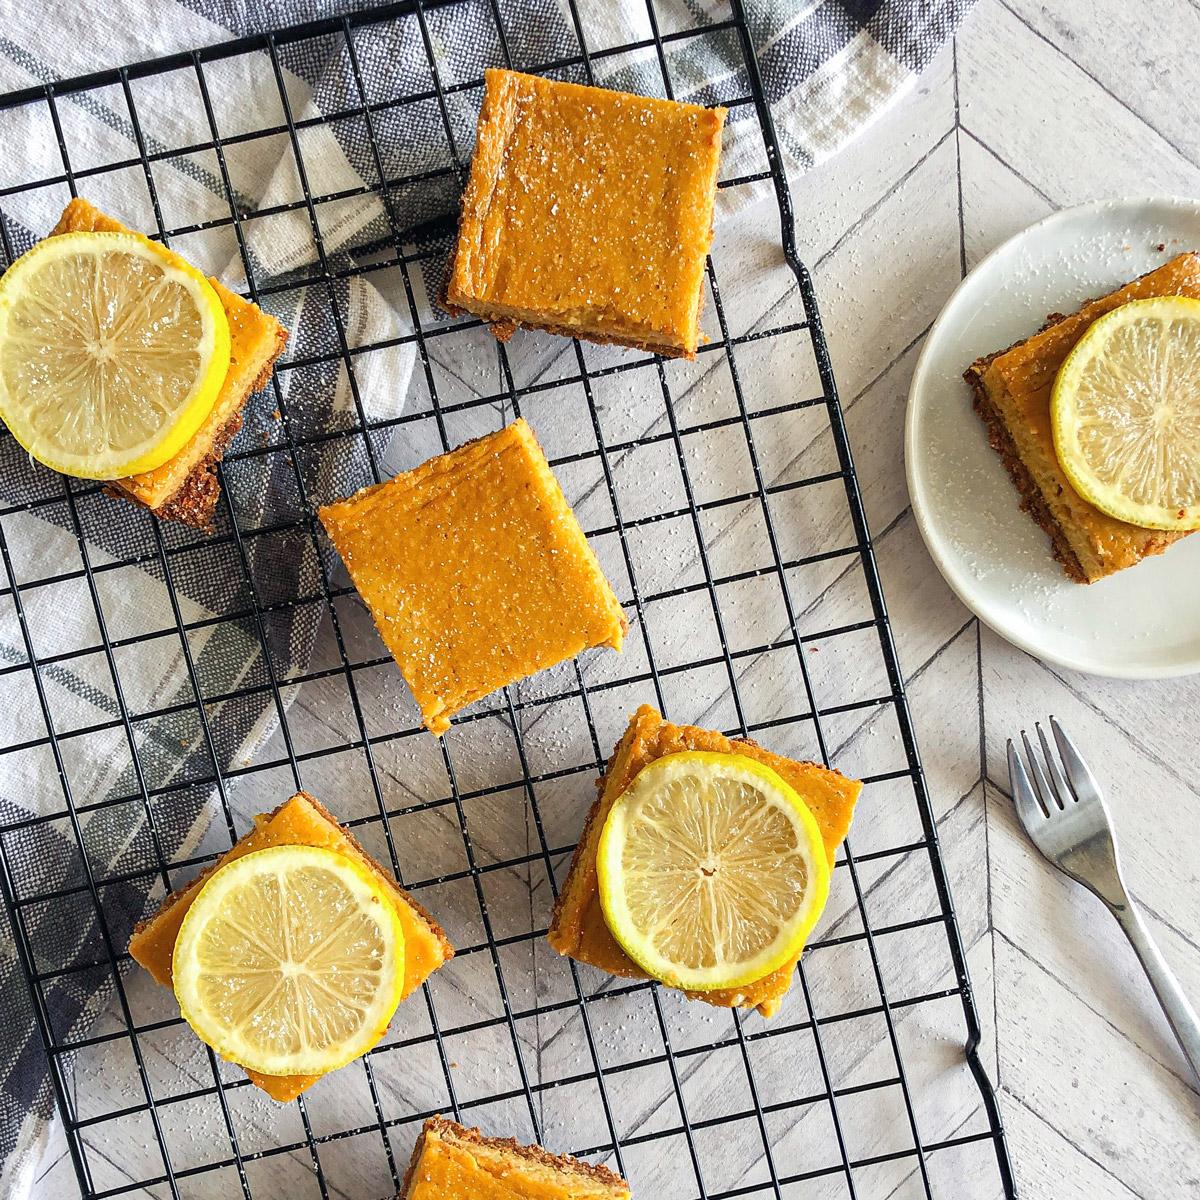 mango lemon shortbread bars overhead shot on cooling rack with lemon slices on top featured